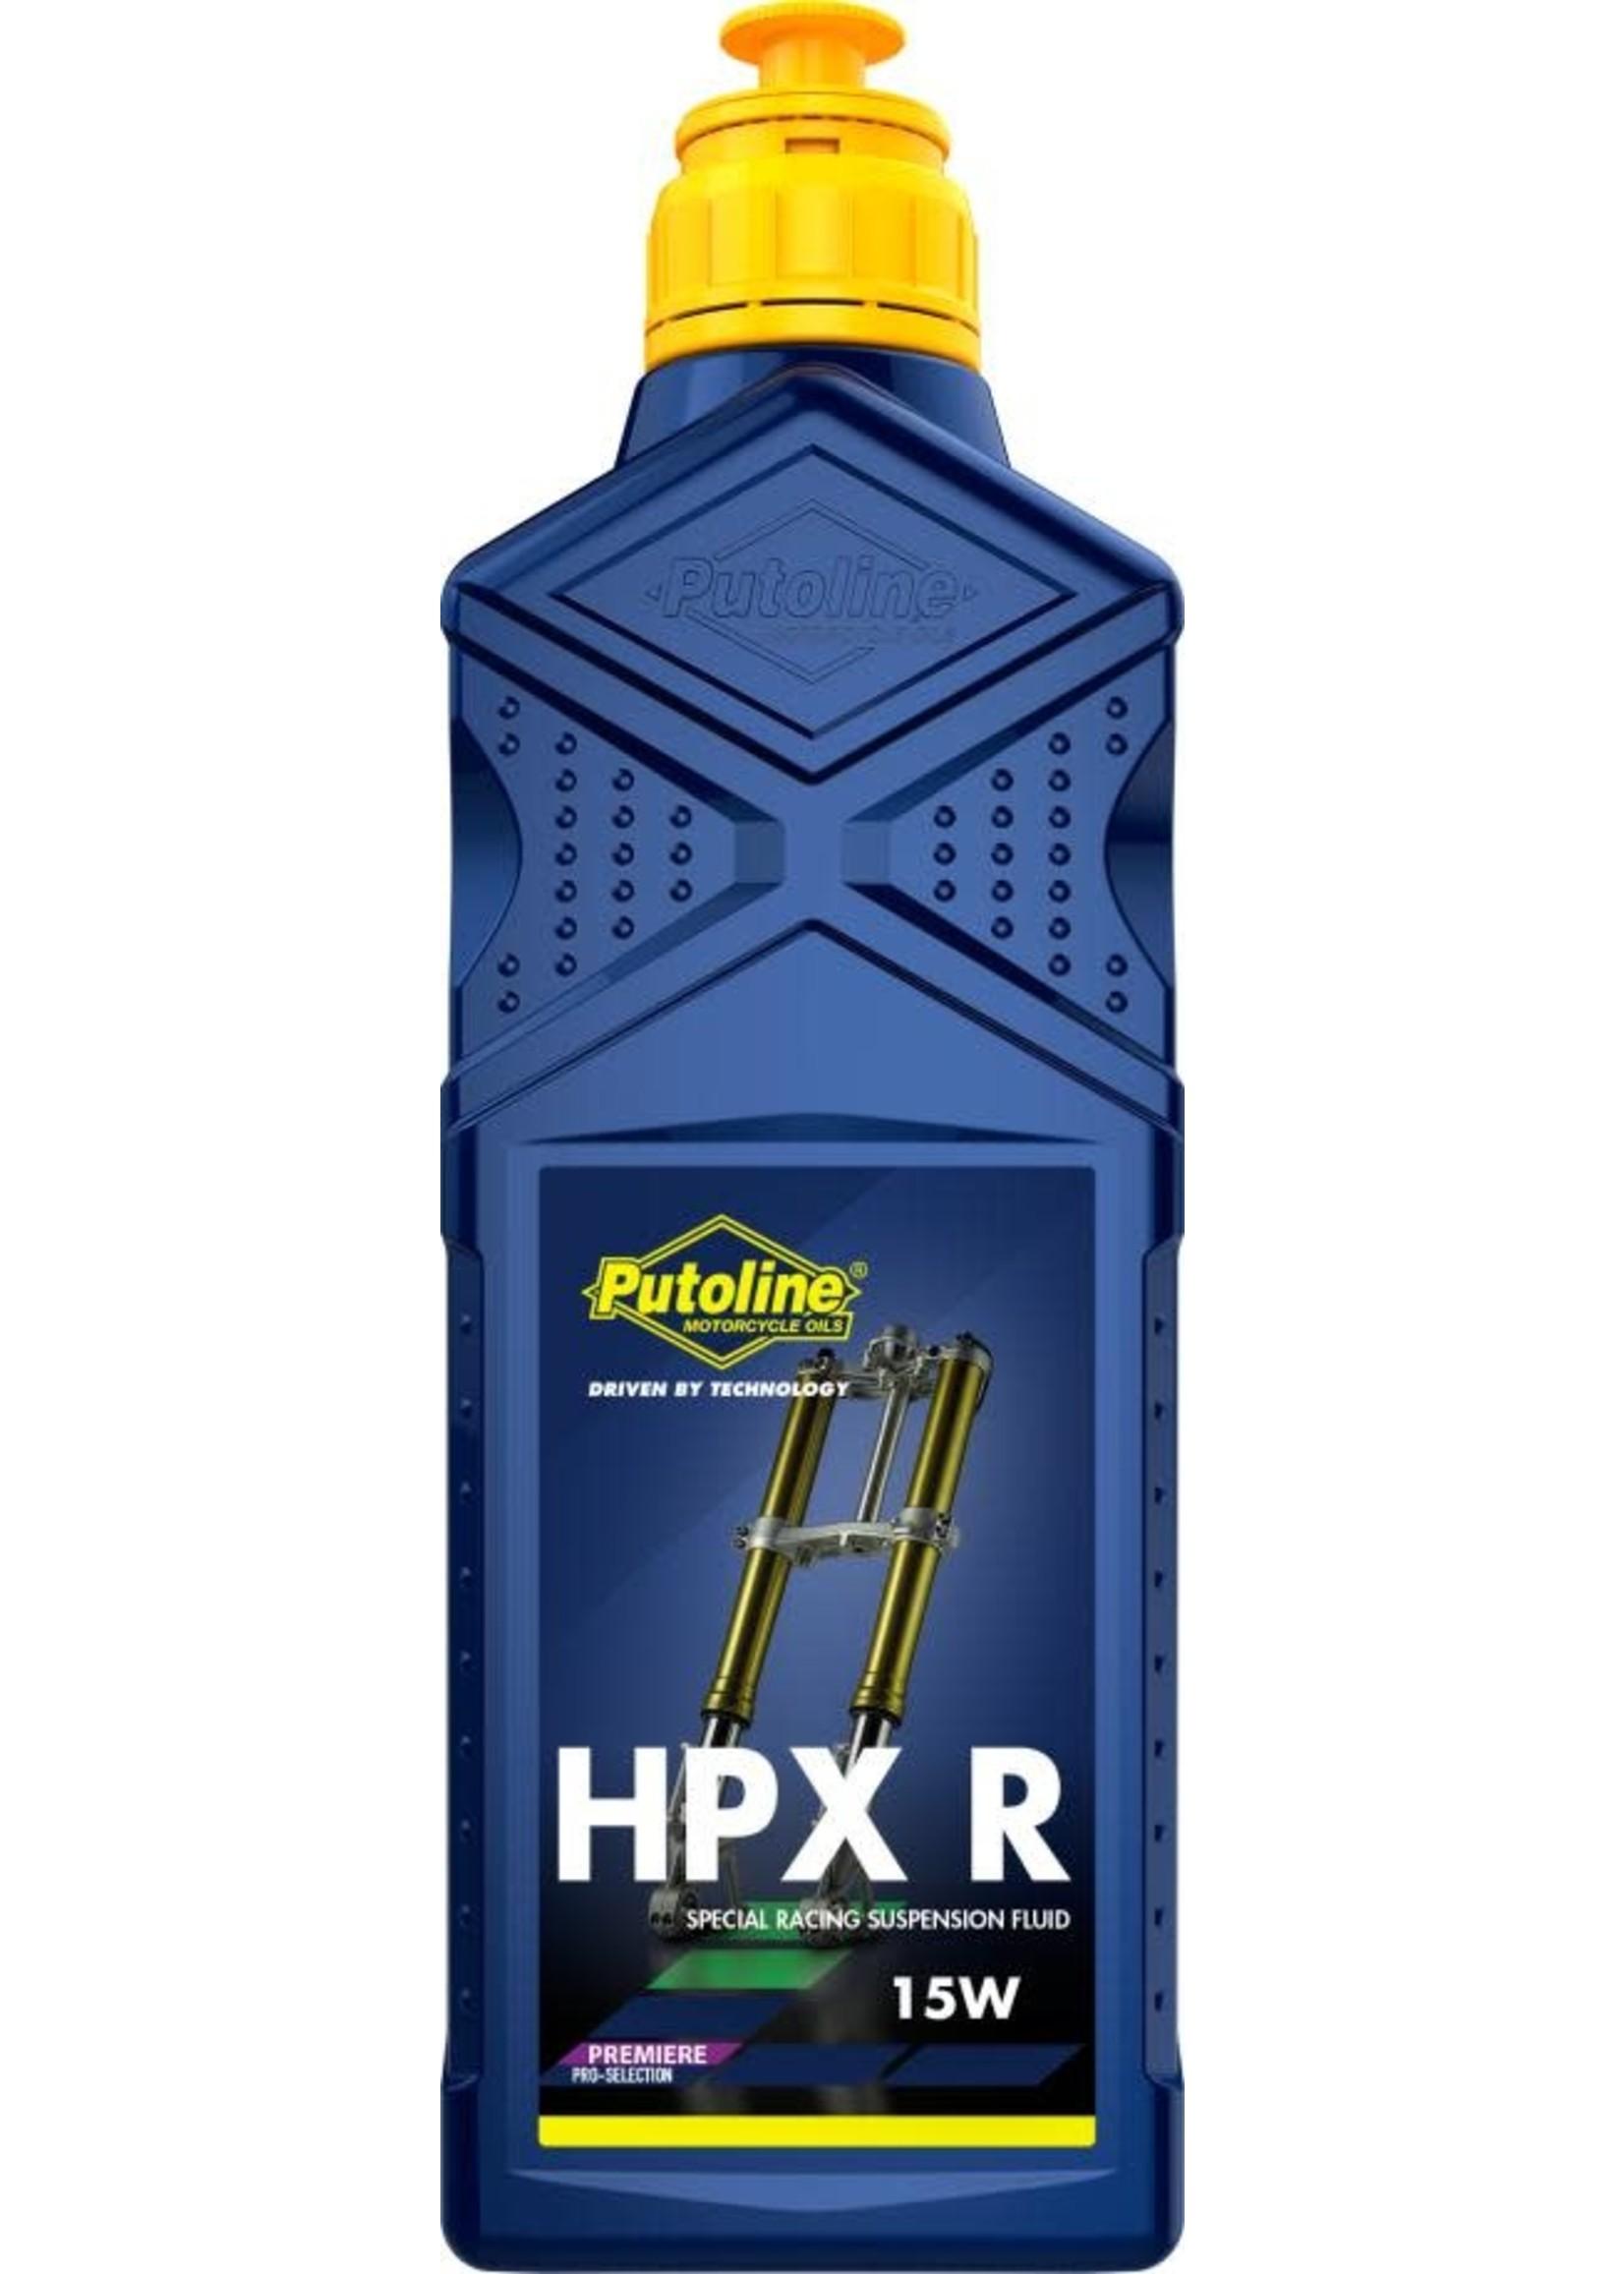 Putoline HPX R 15W 1L